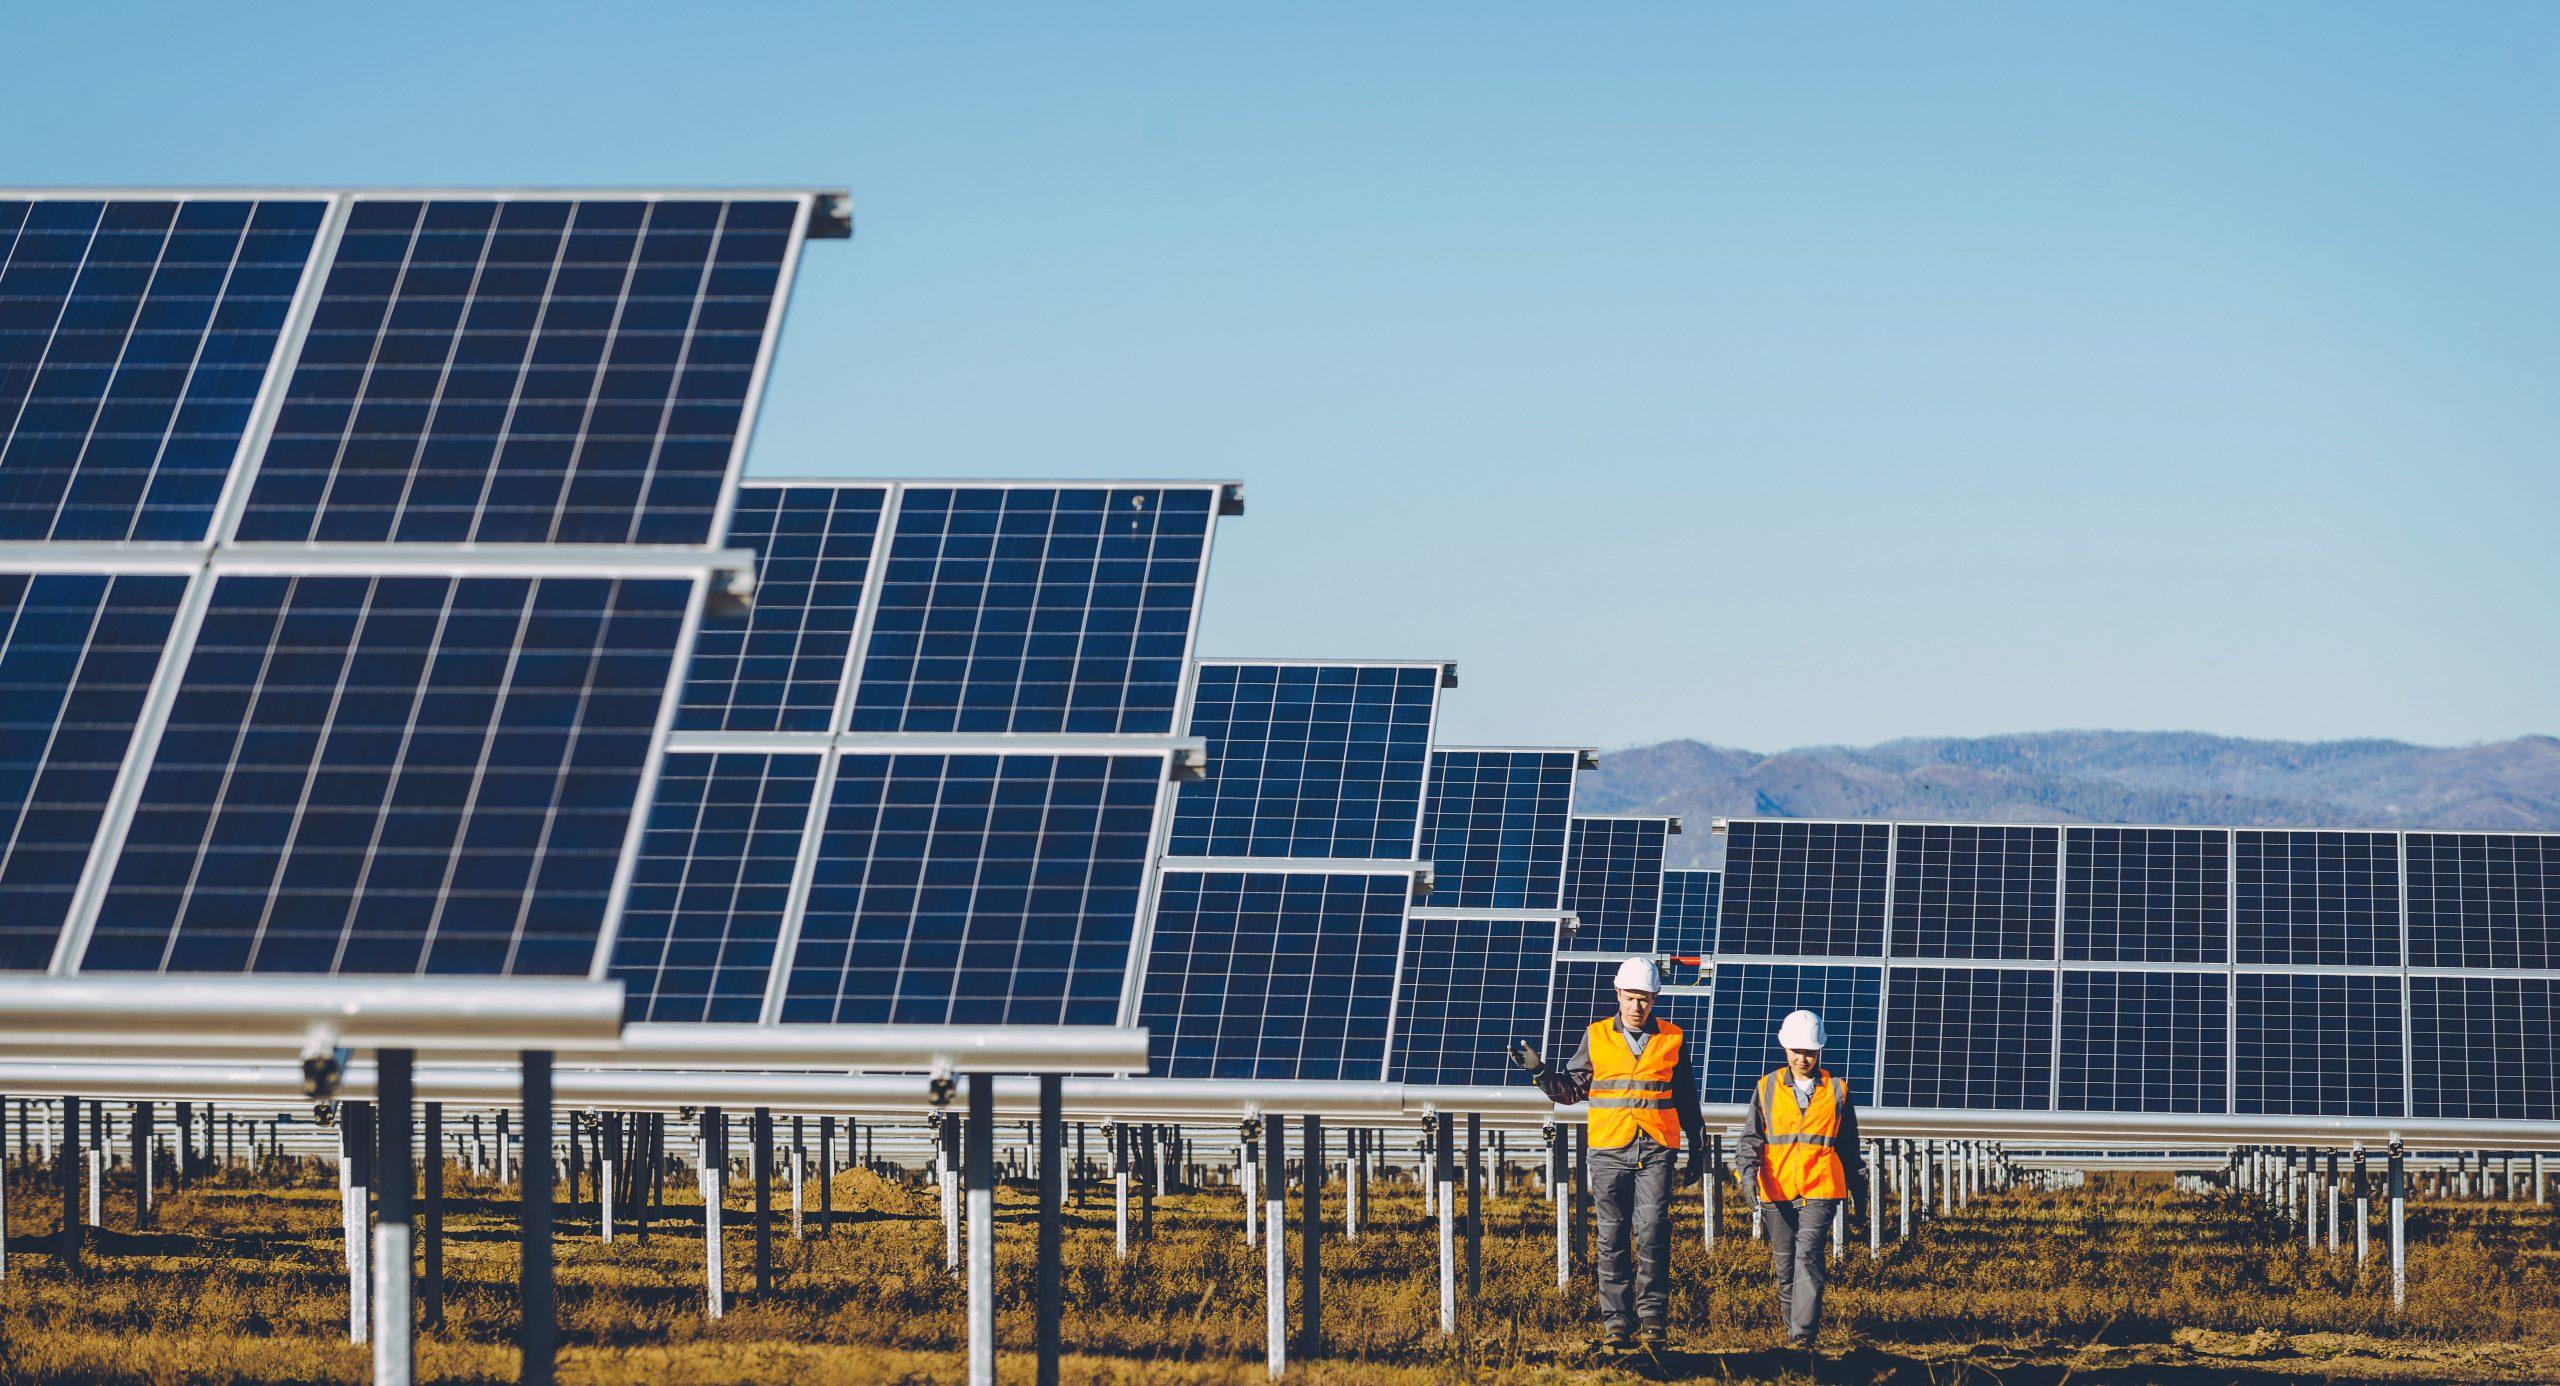 Solar Farm with People Walking